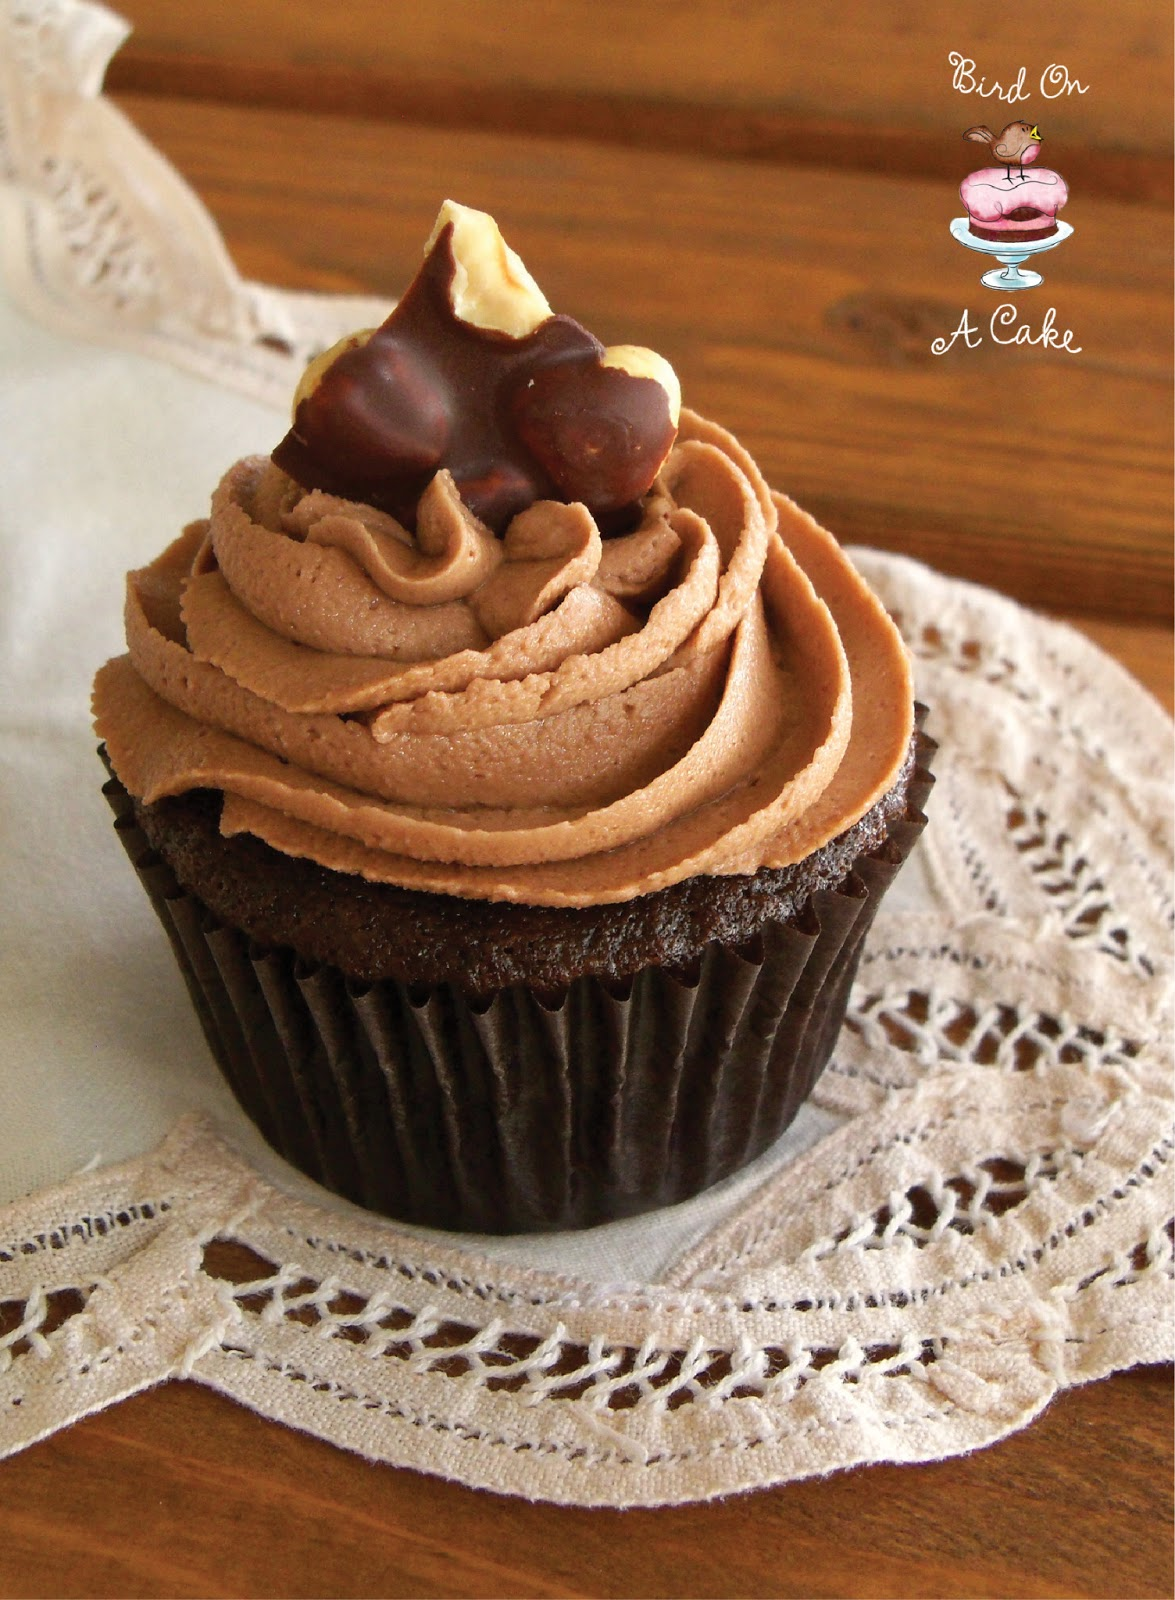 ... some more yummy chocolate recipe s nutella chocolate hazelnut cupcakes